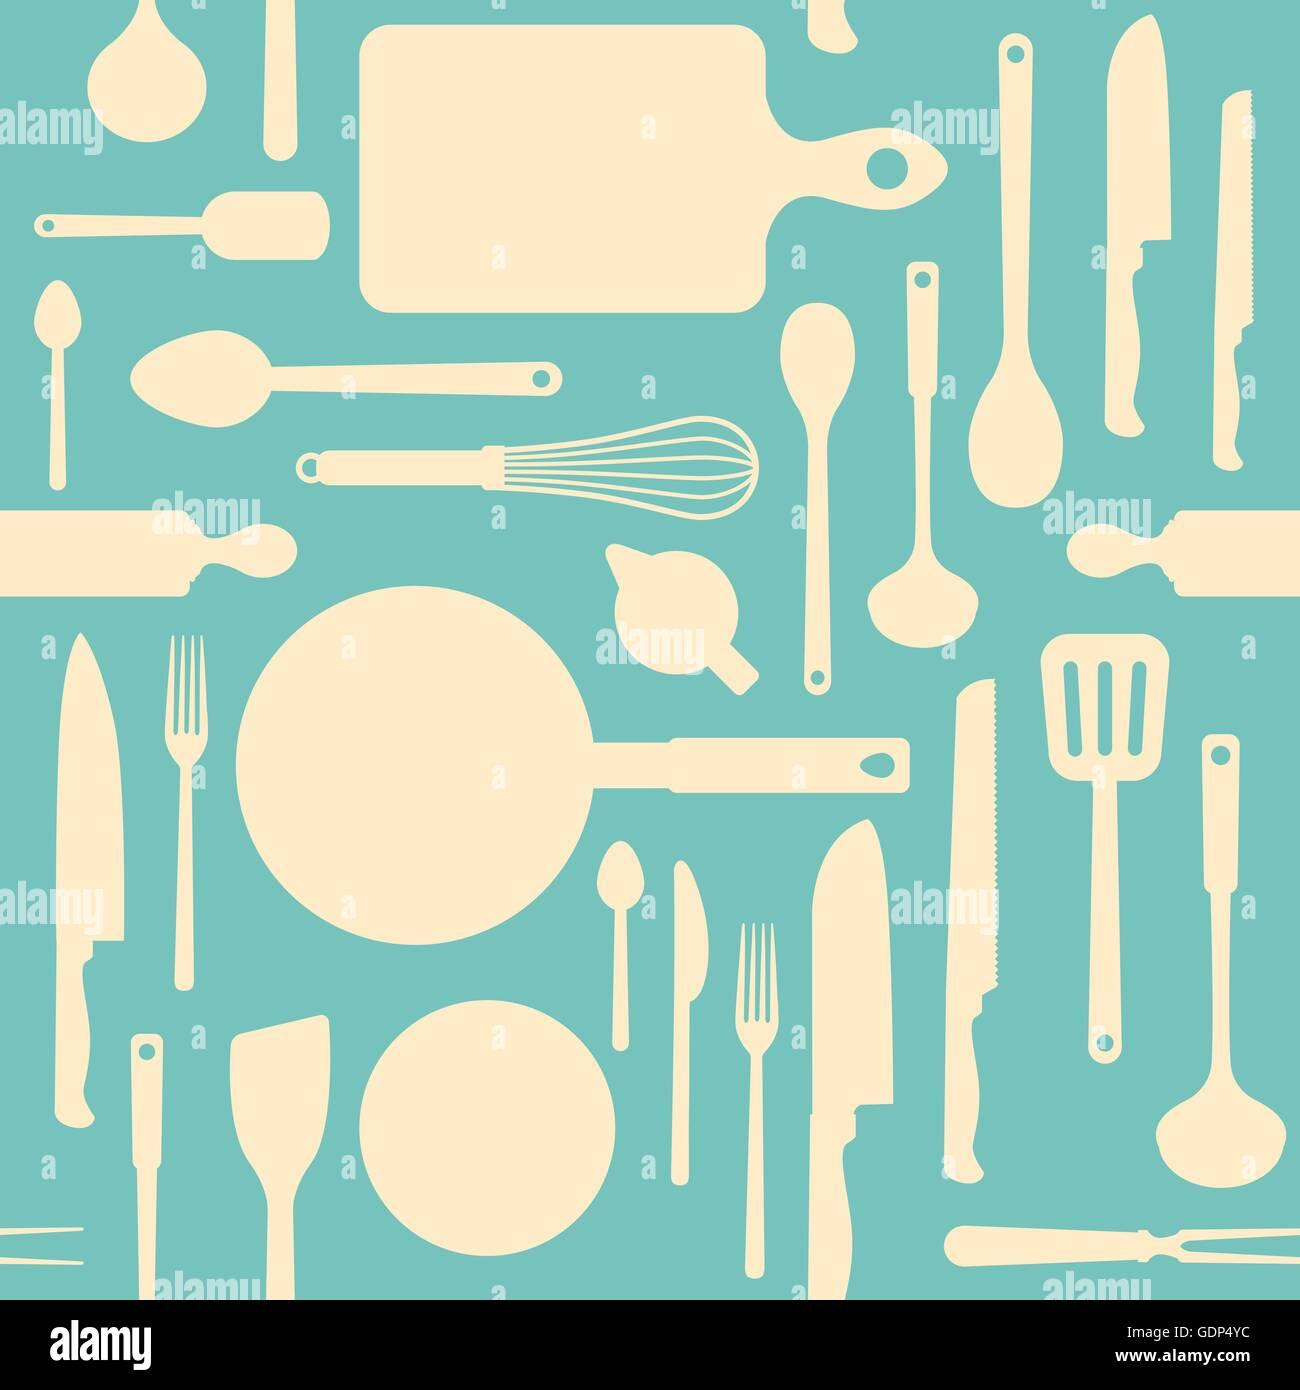 Kitchen Utensils Silhouette Vector Stock Photos & Kitchen Utensils ...